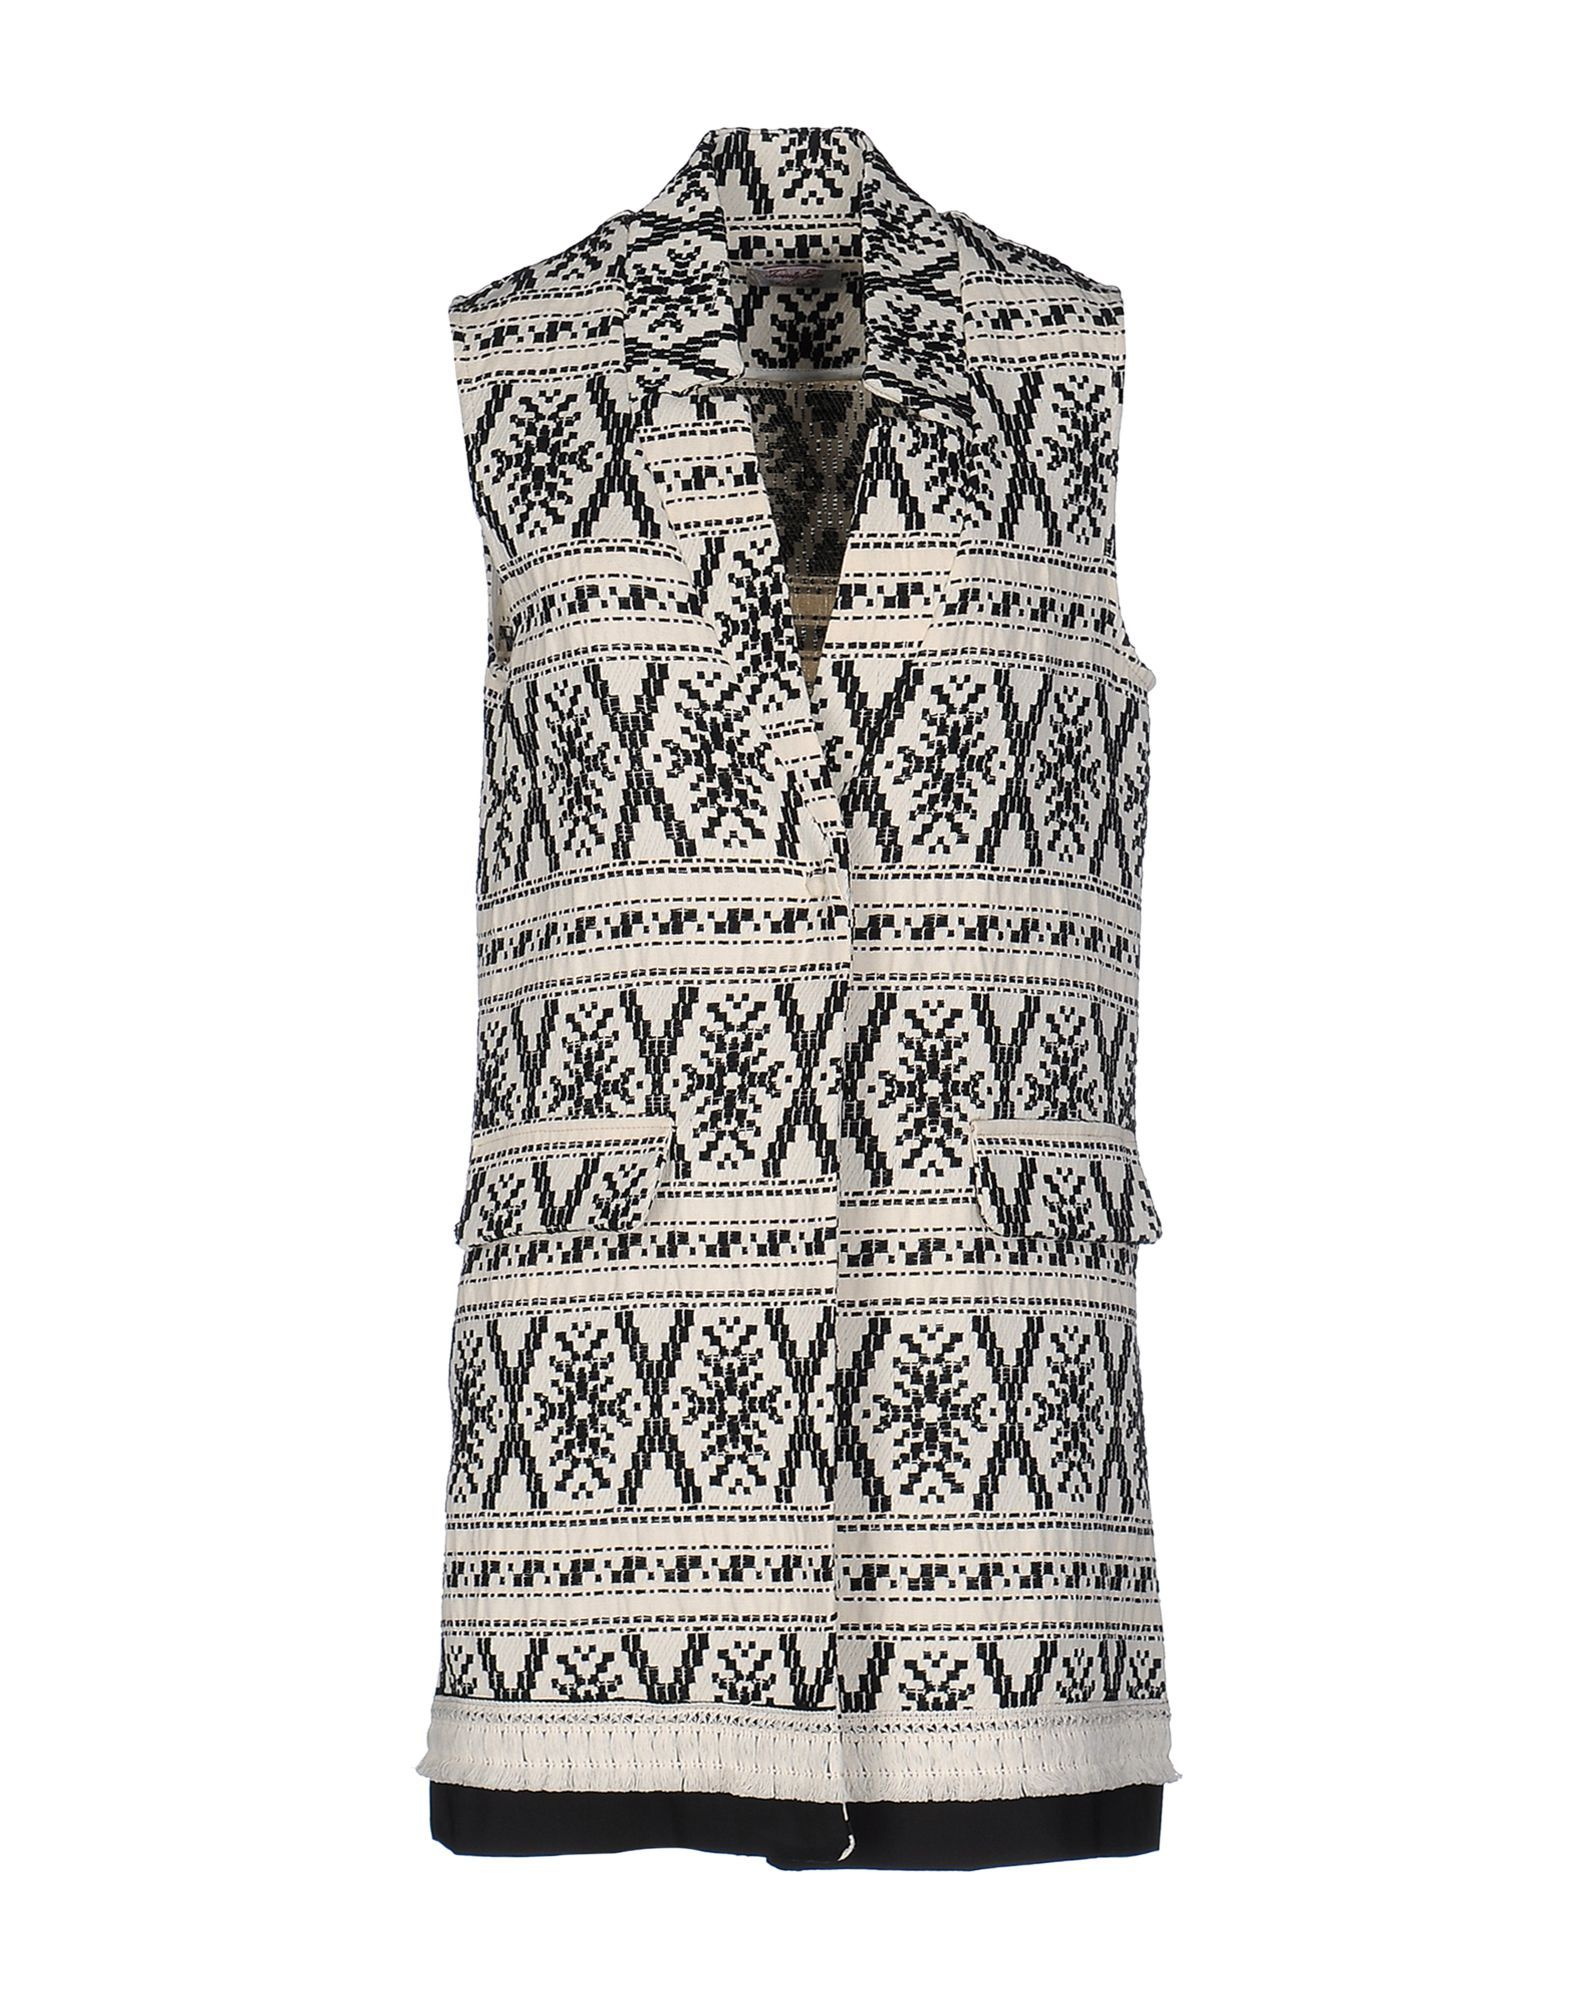 Twenty Easy By Kaos Ivory Jacquard Cotton Sleeveless Jacket